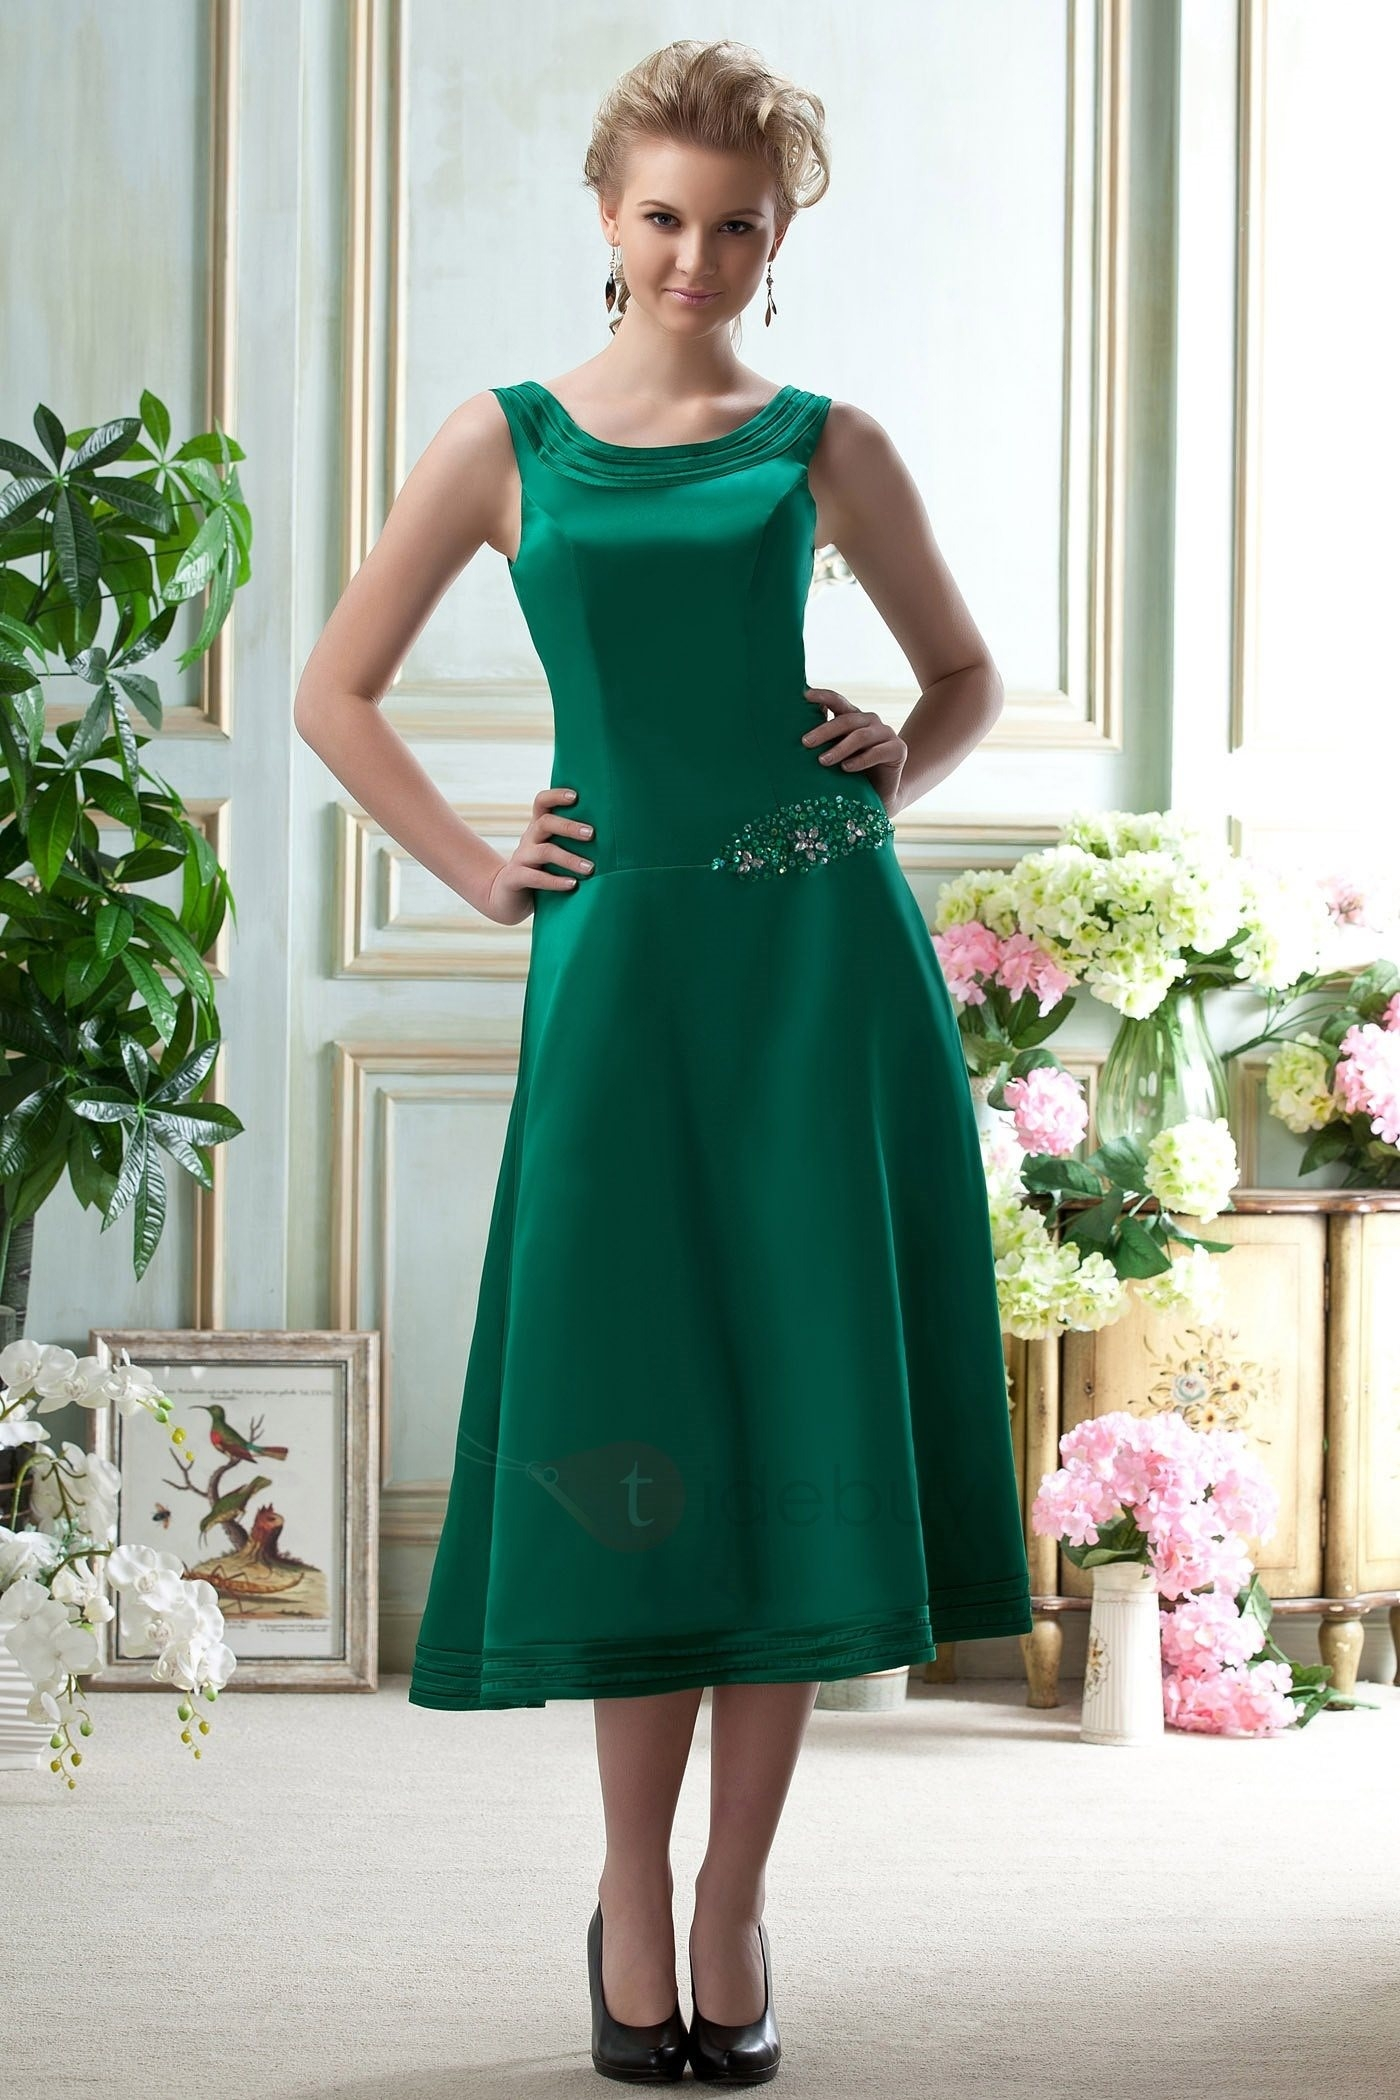 10 Top Elegante Kleider Wadenlang Boutique15 Wunderbar Elegante Kleider Wadenlang Boutique